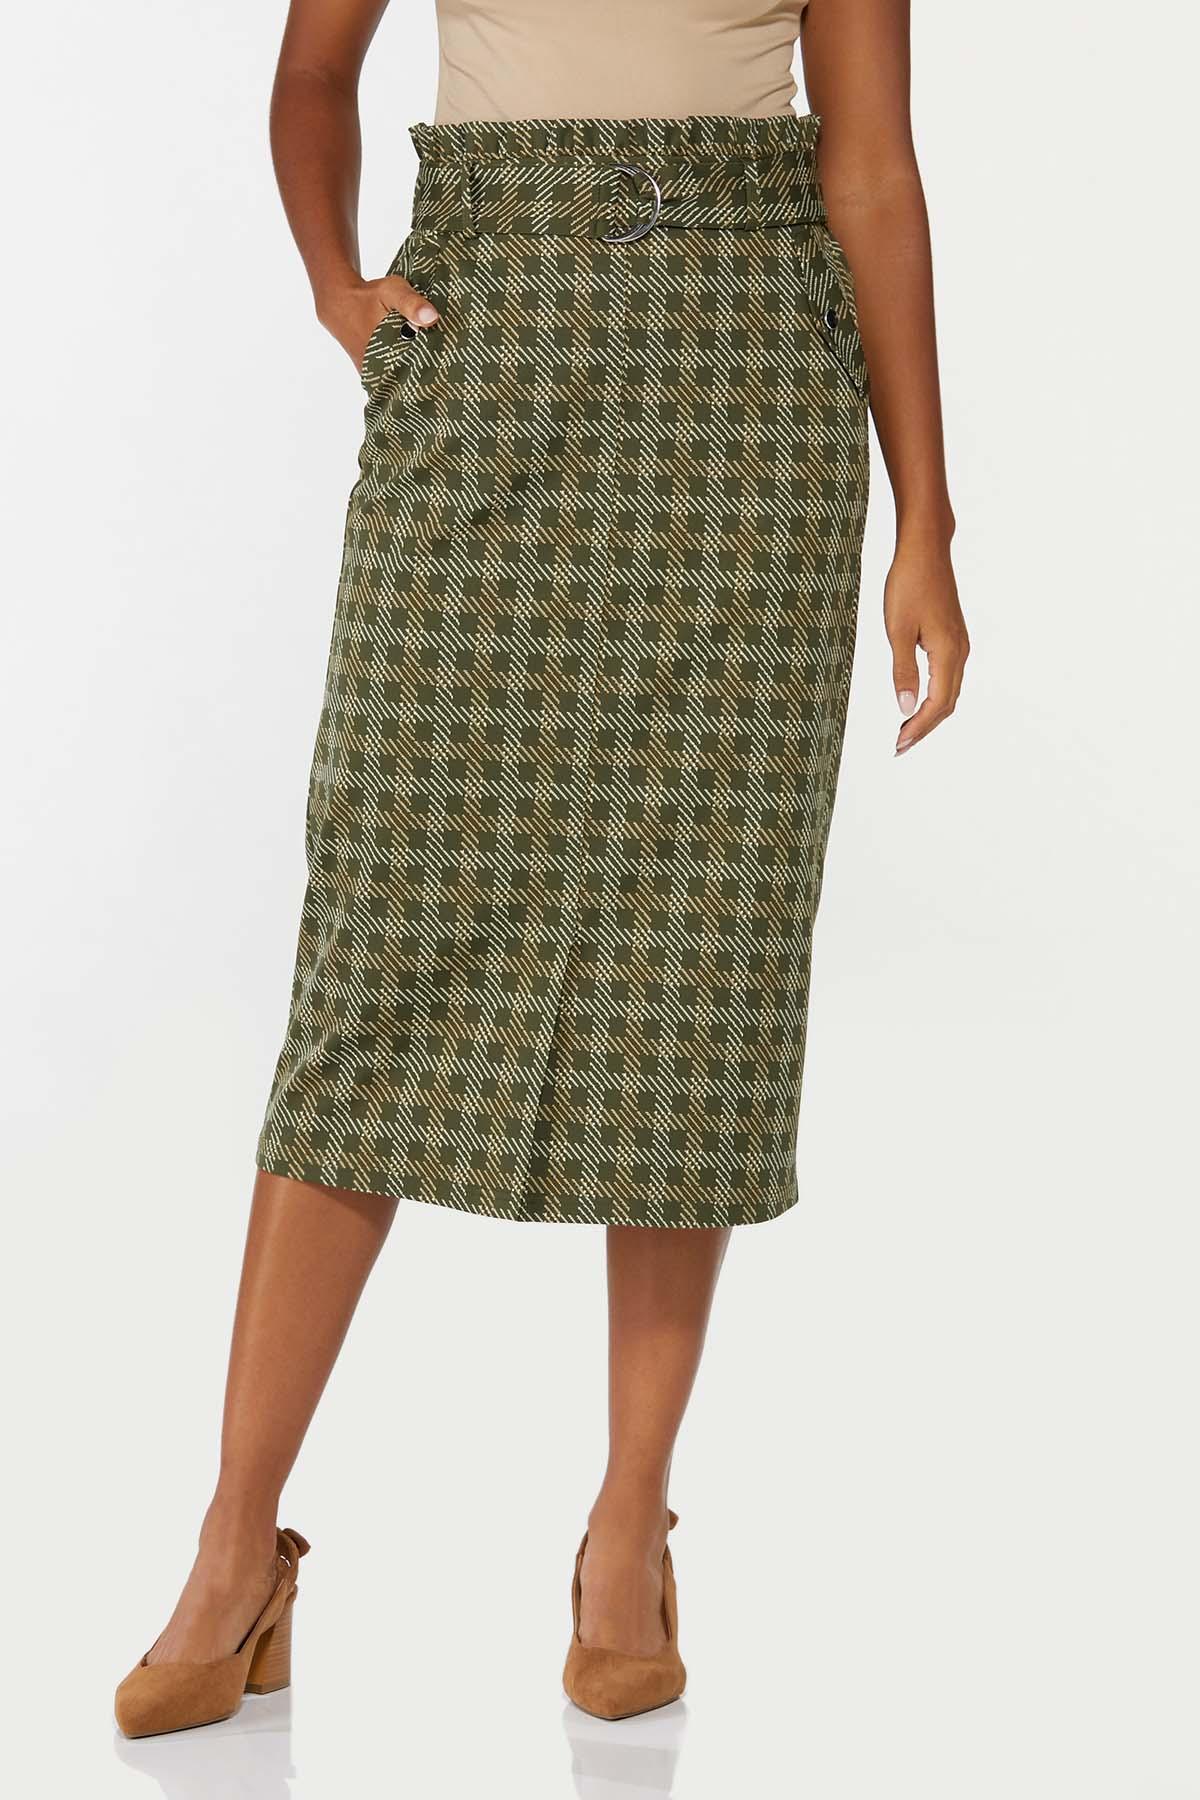 Plus Size Ruffled Plaid Pencil Skirt (Item #44697061)